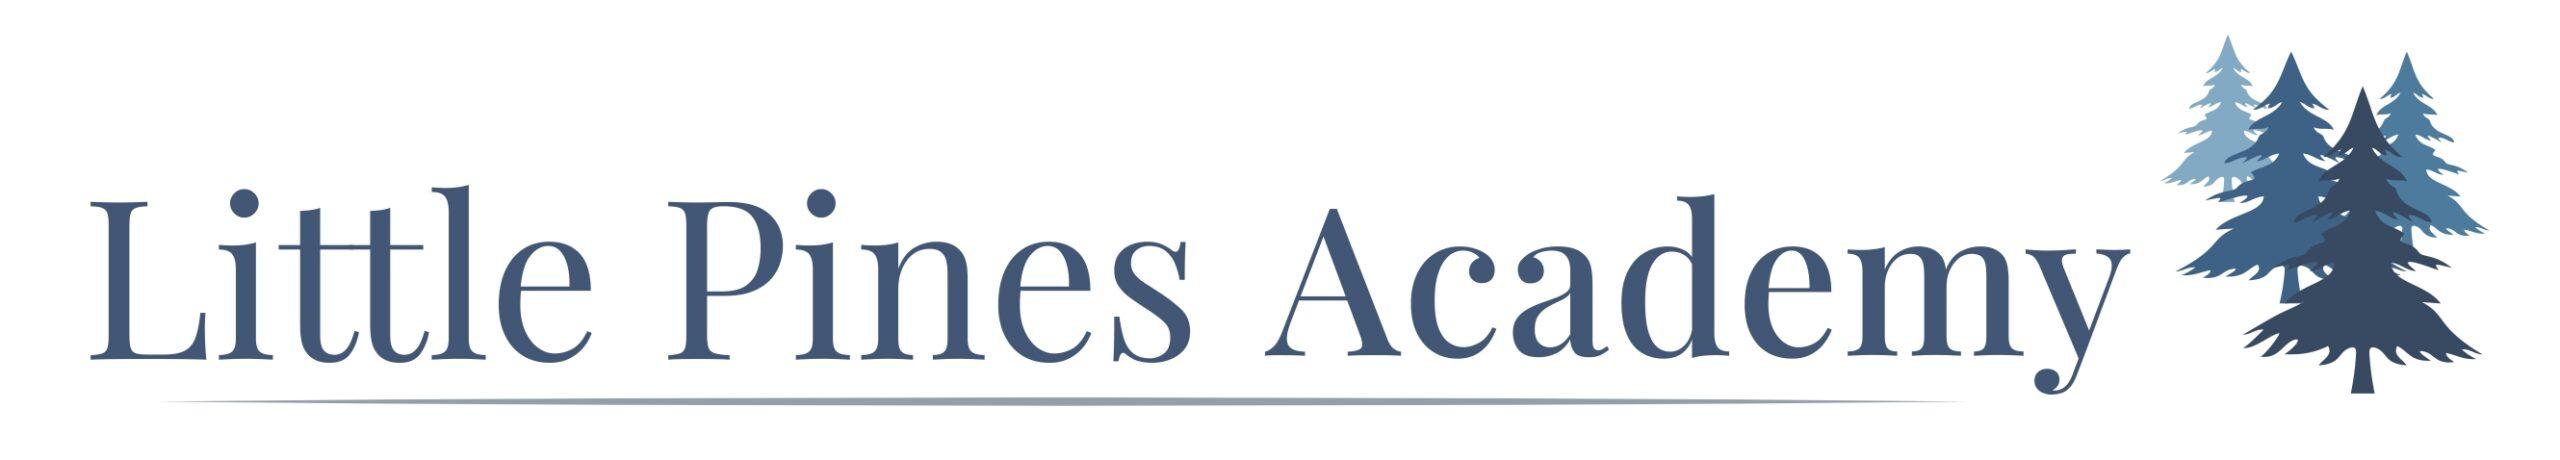 Little Pines Academy